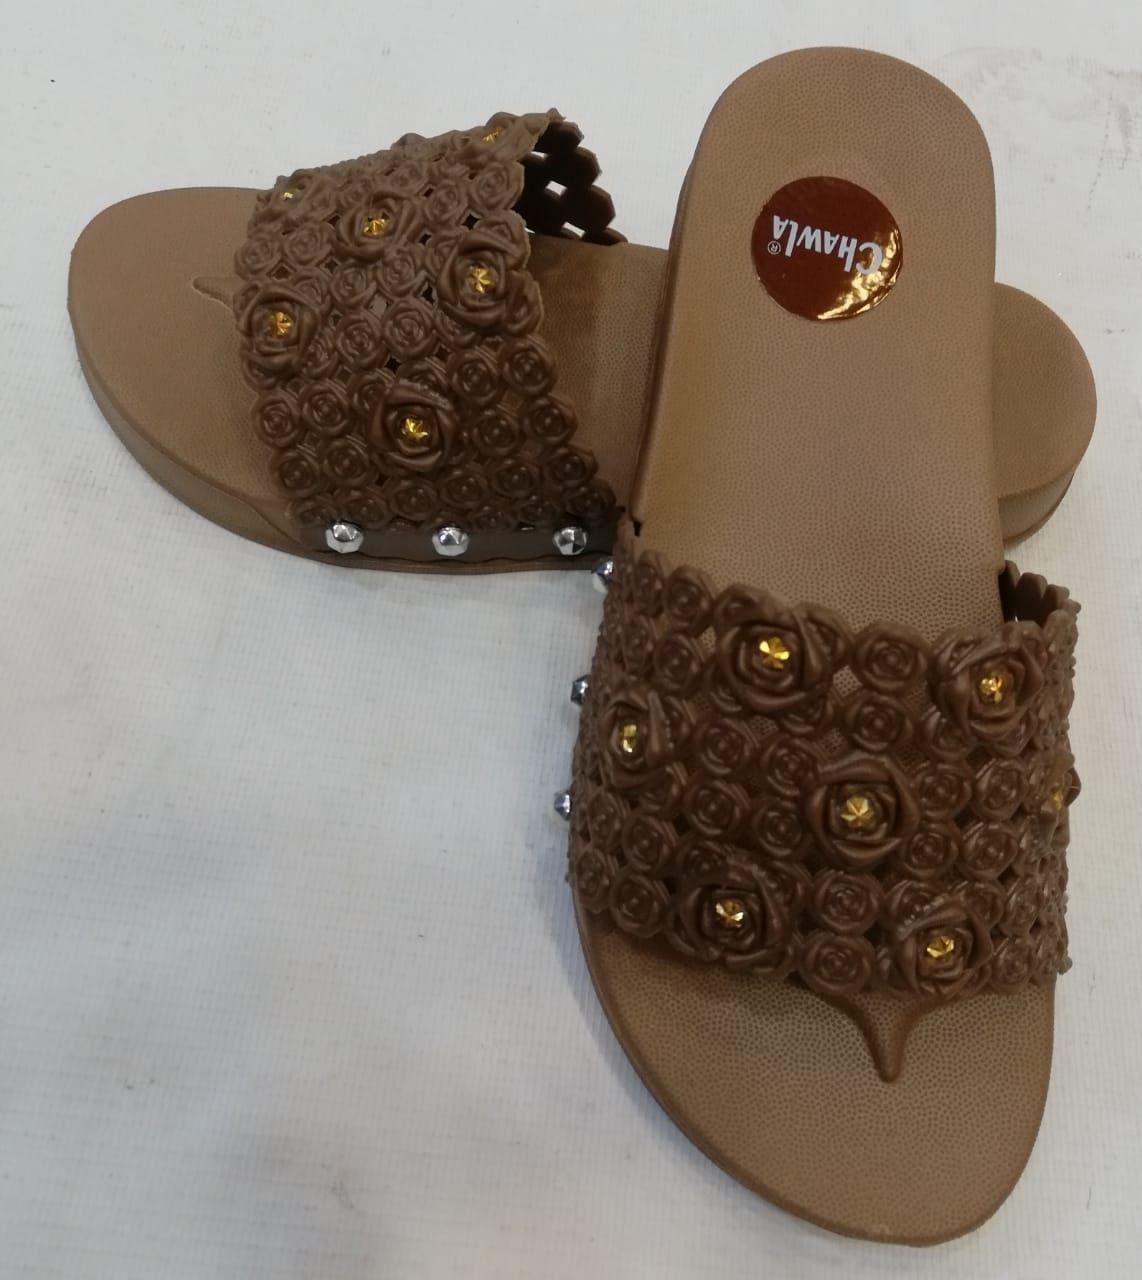 b421e635da1c Women s Slipper   Flip Flops Online in Pakistan - Daraz.pk